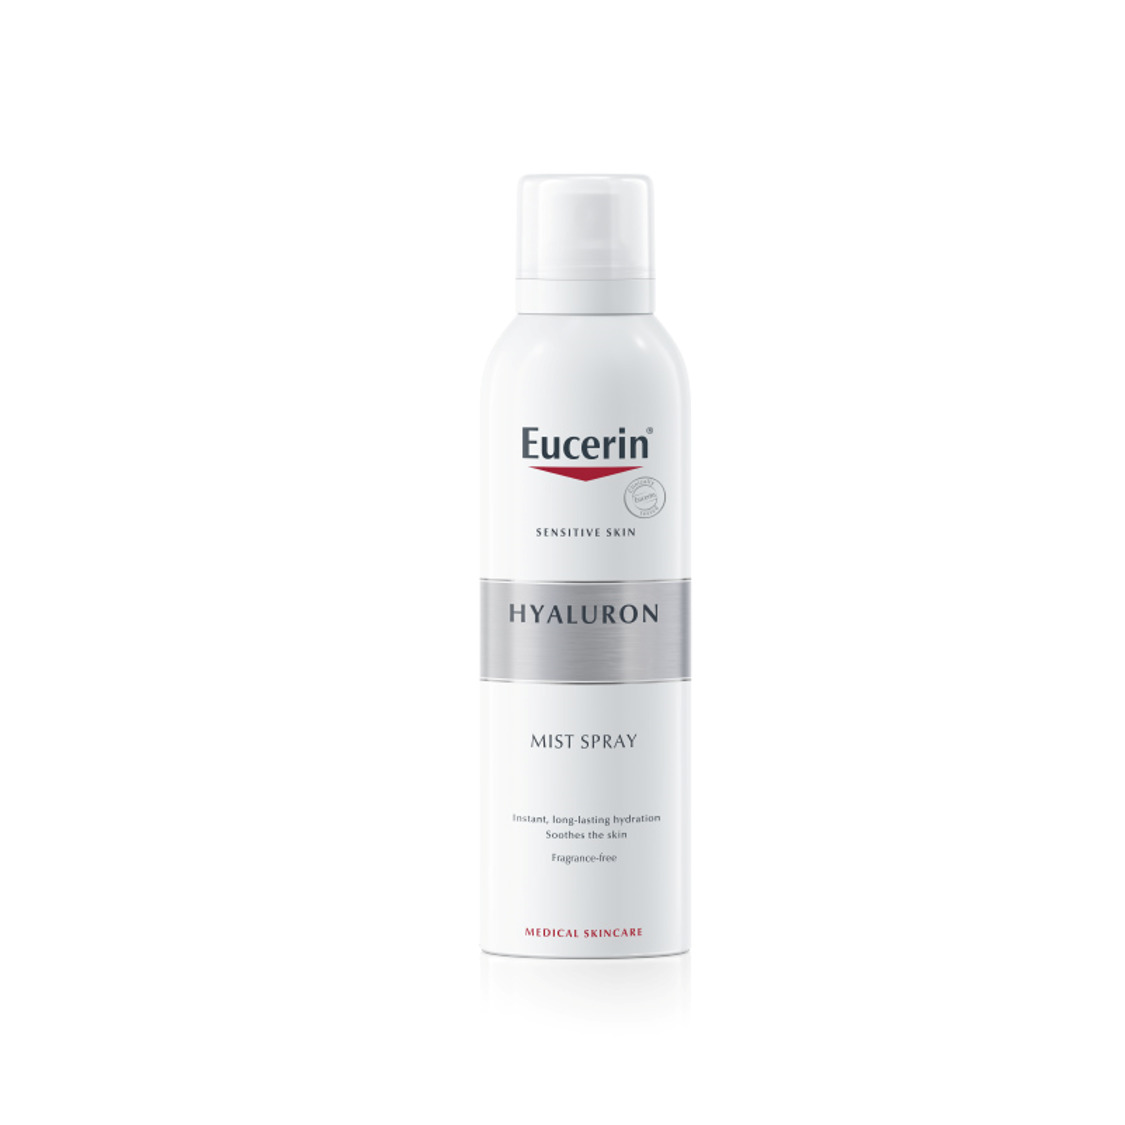 Xịt dưỡng ẩm ngăn ngừa lão hóa Eucerin Hyaluron Mist Spray 150ml